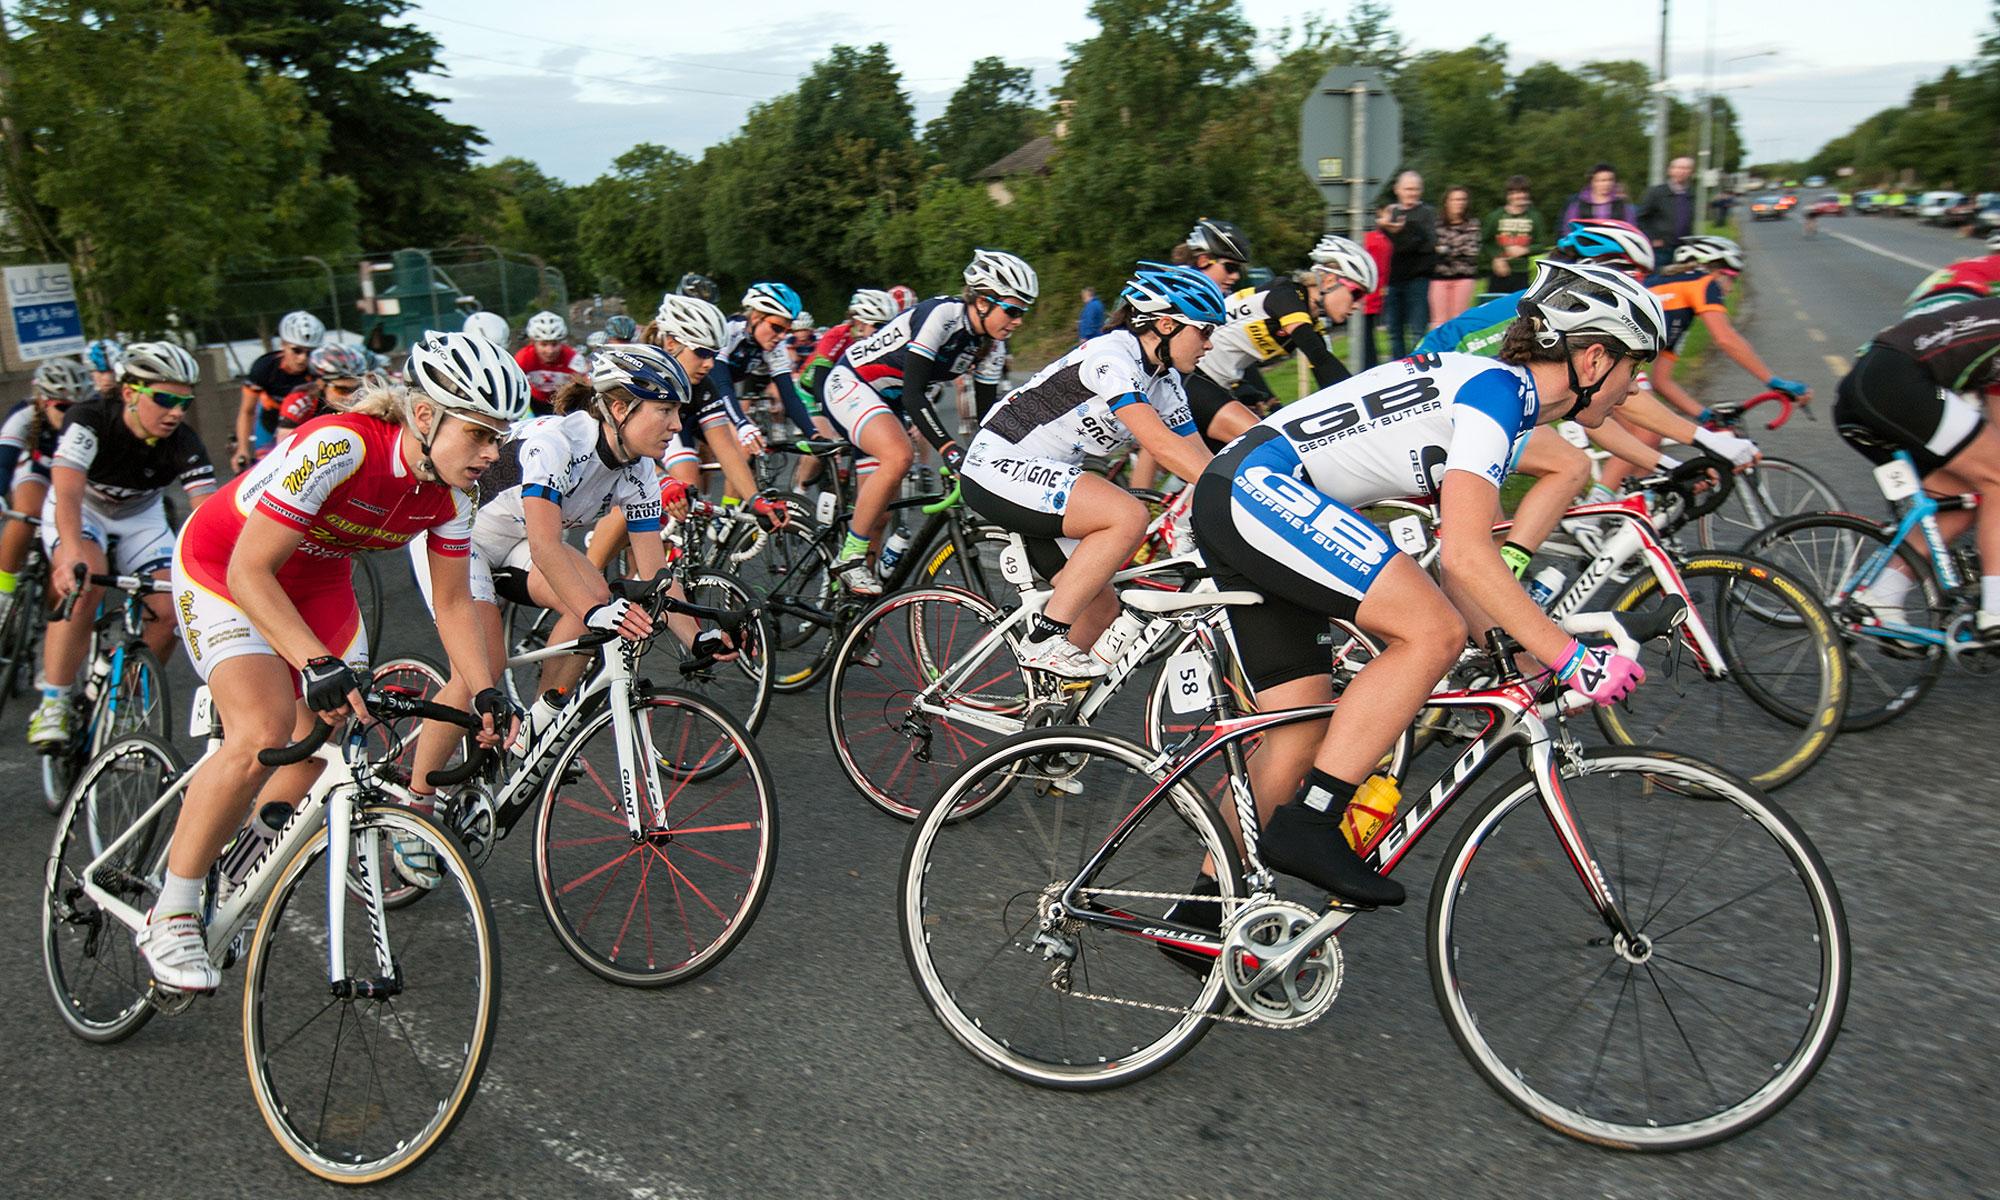 2013 Rás na mBan Stage 4